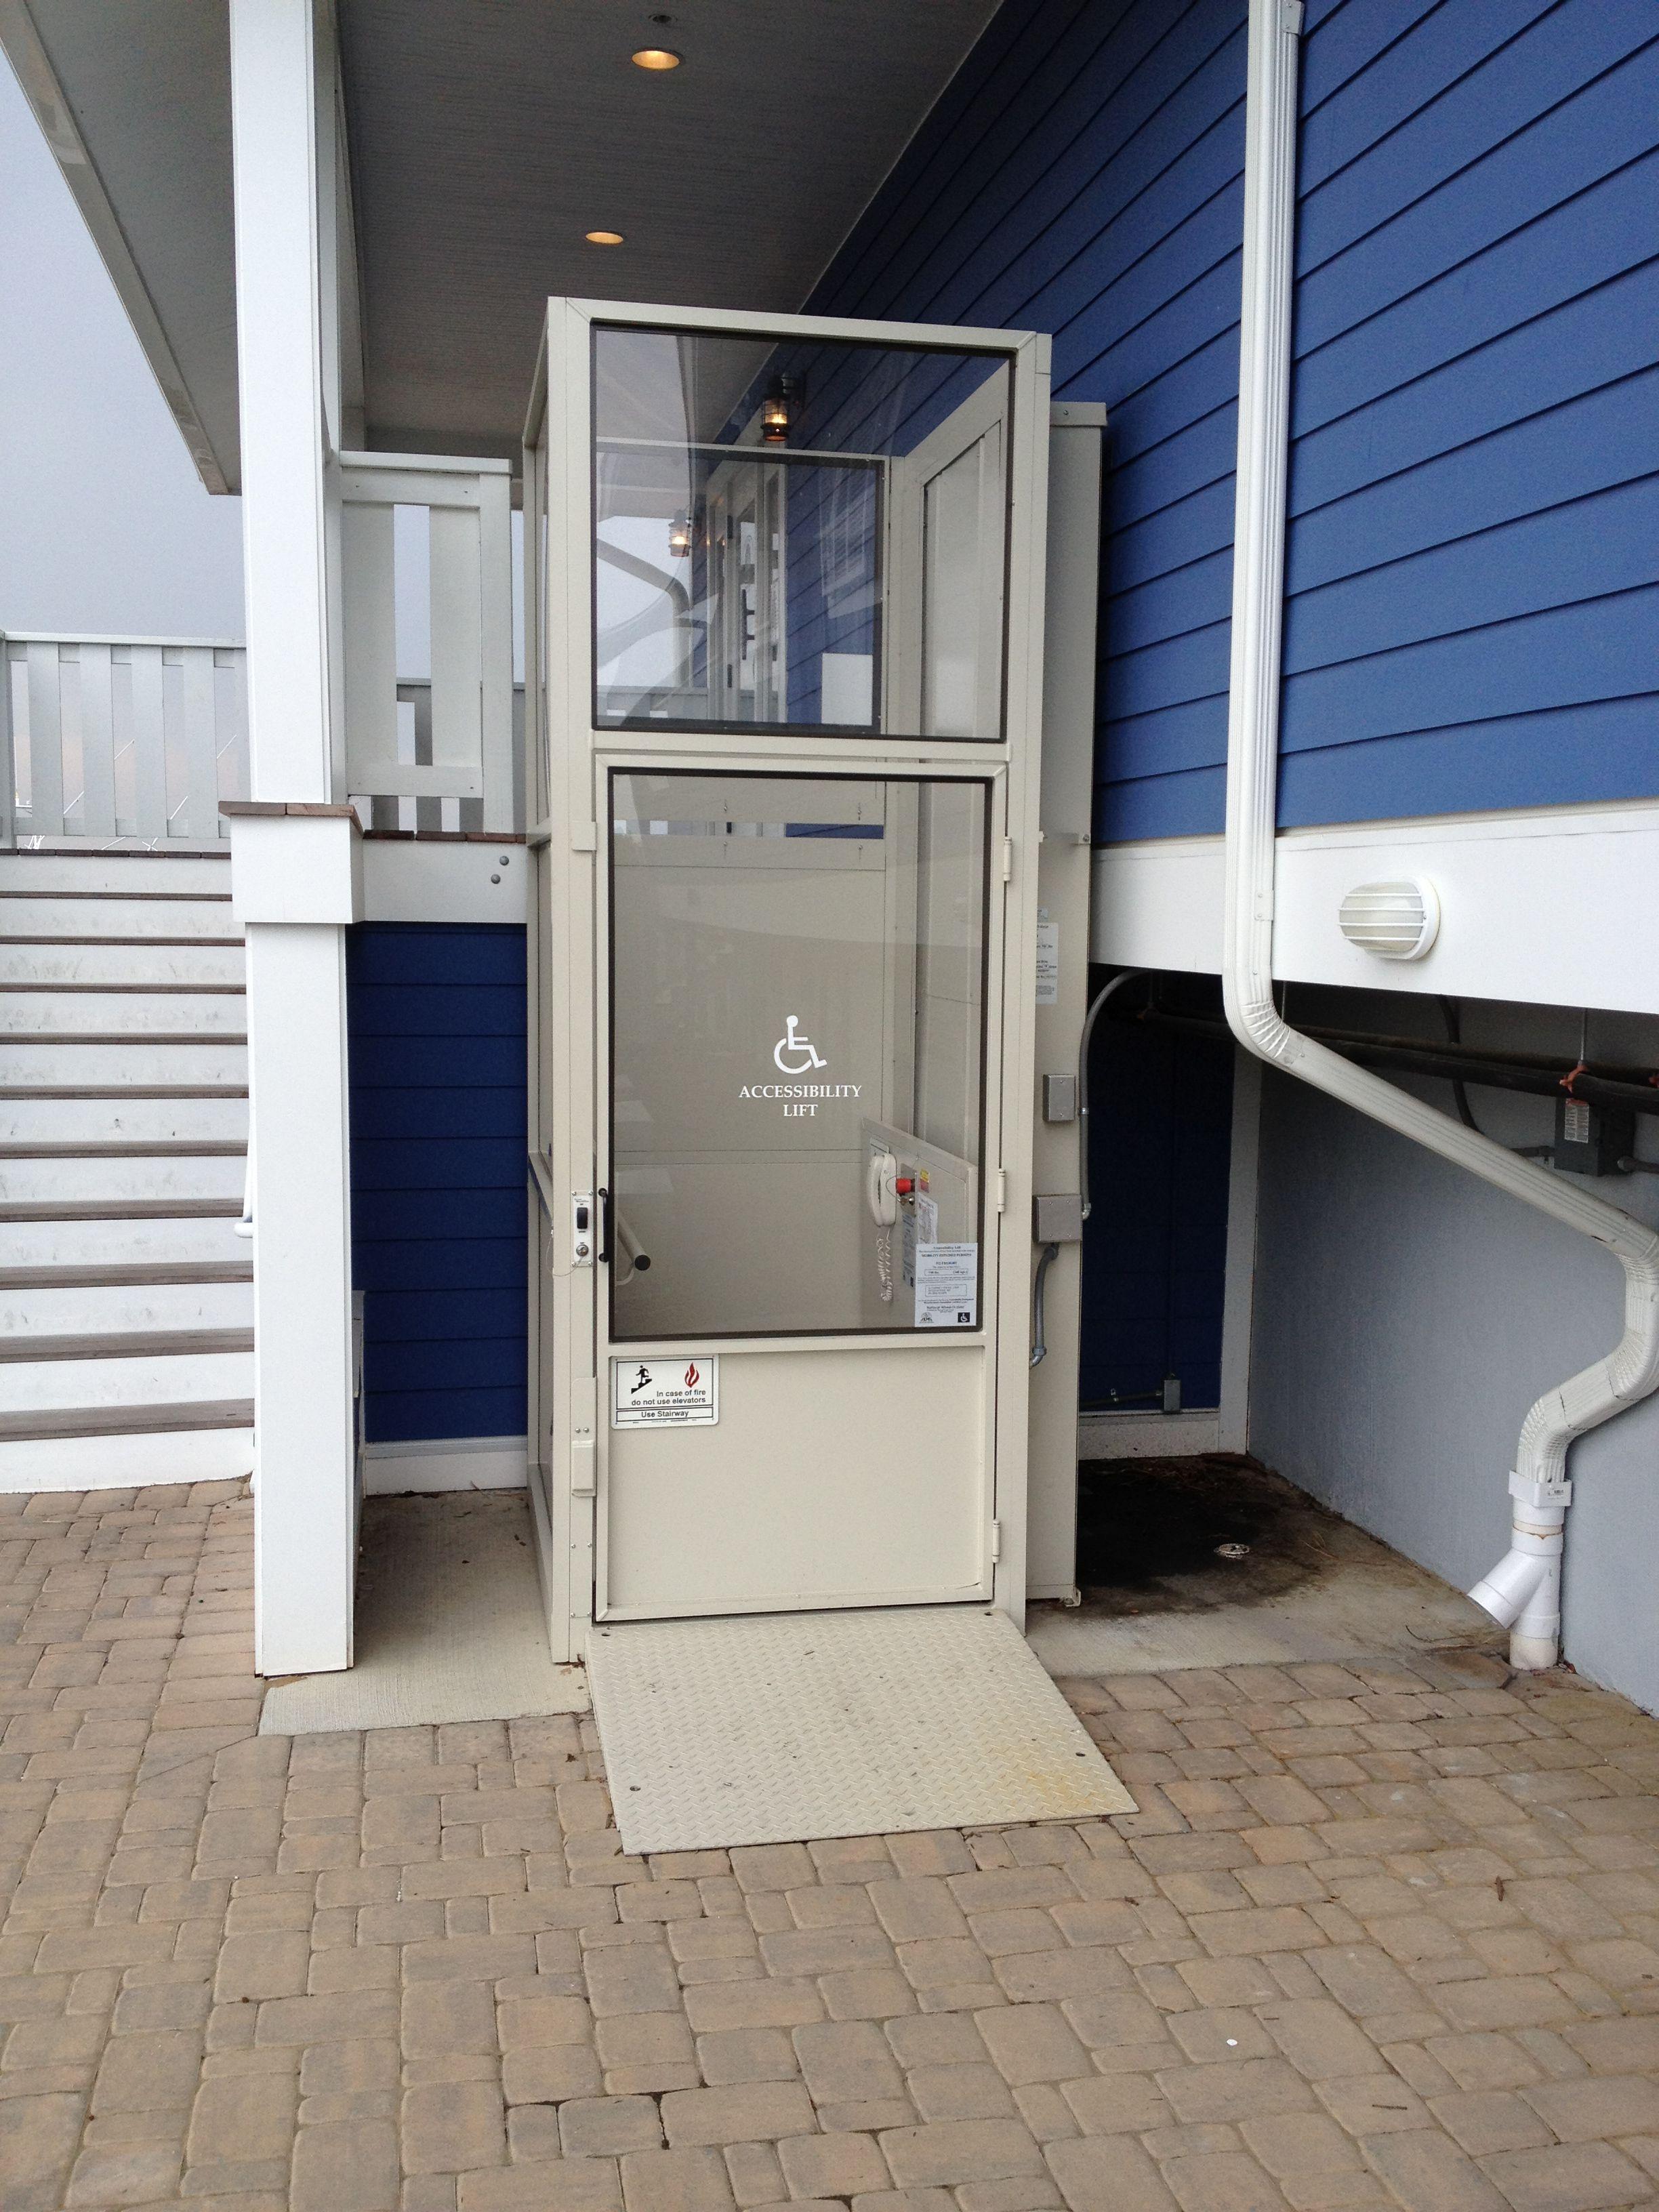 Exterior Wheelchair Lifts Home Exterior Home Elevators With Exterior Home Elevators Non